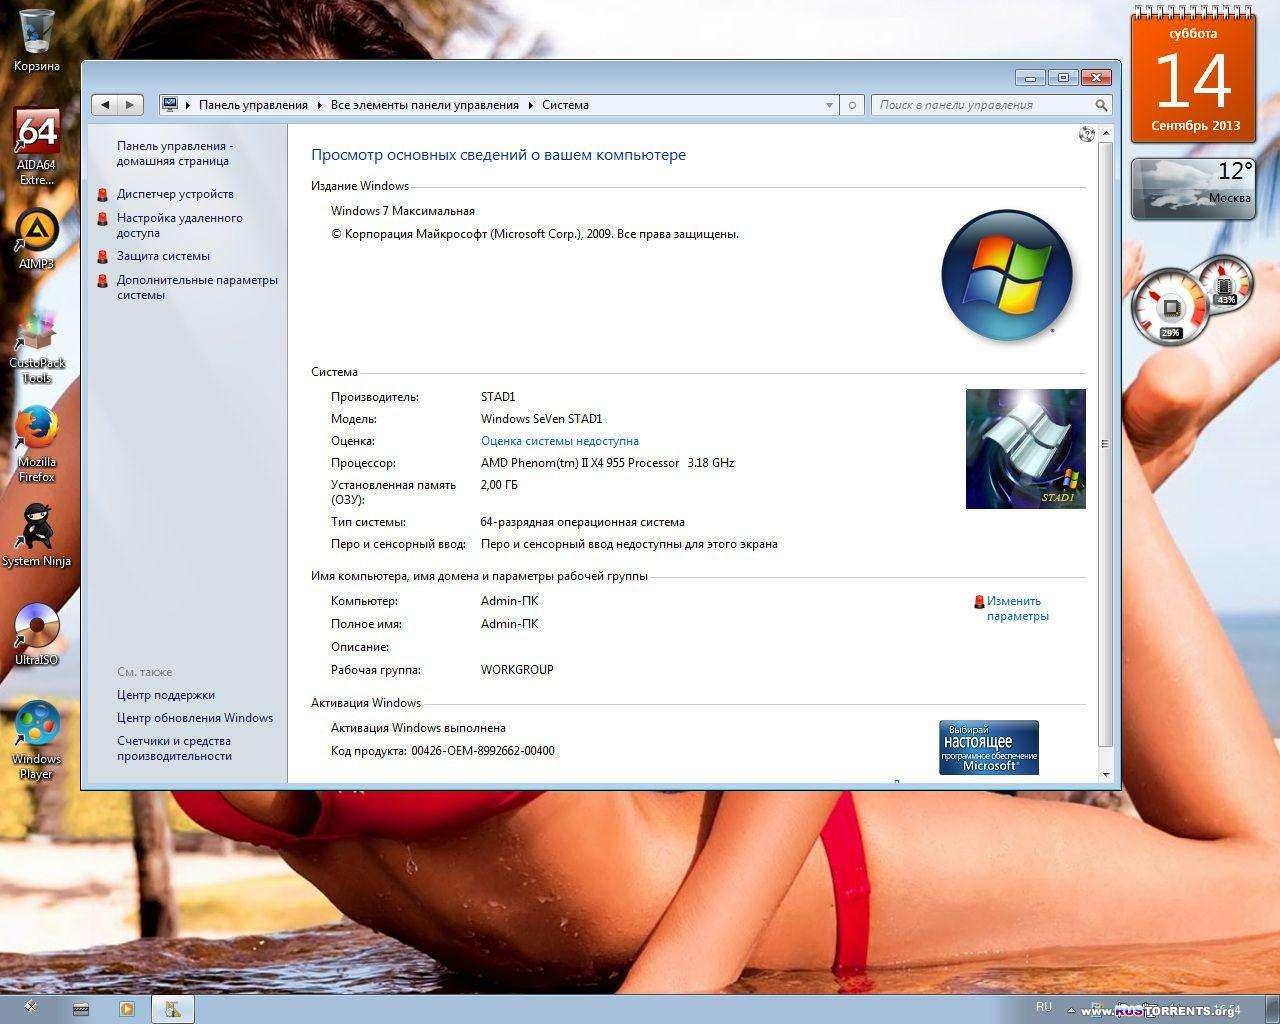 Windows 7 x64 ������������ v3.13 by STAD1 RUS